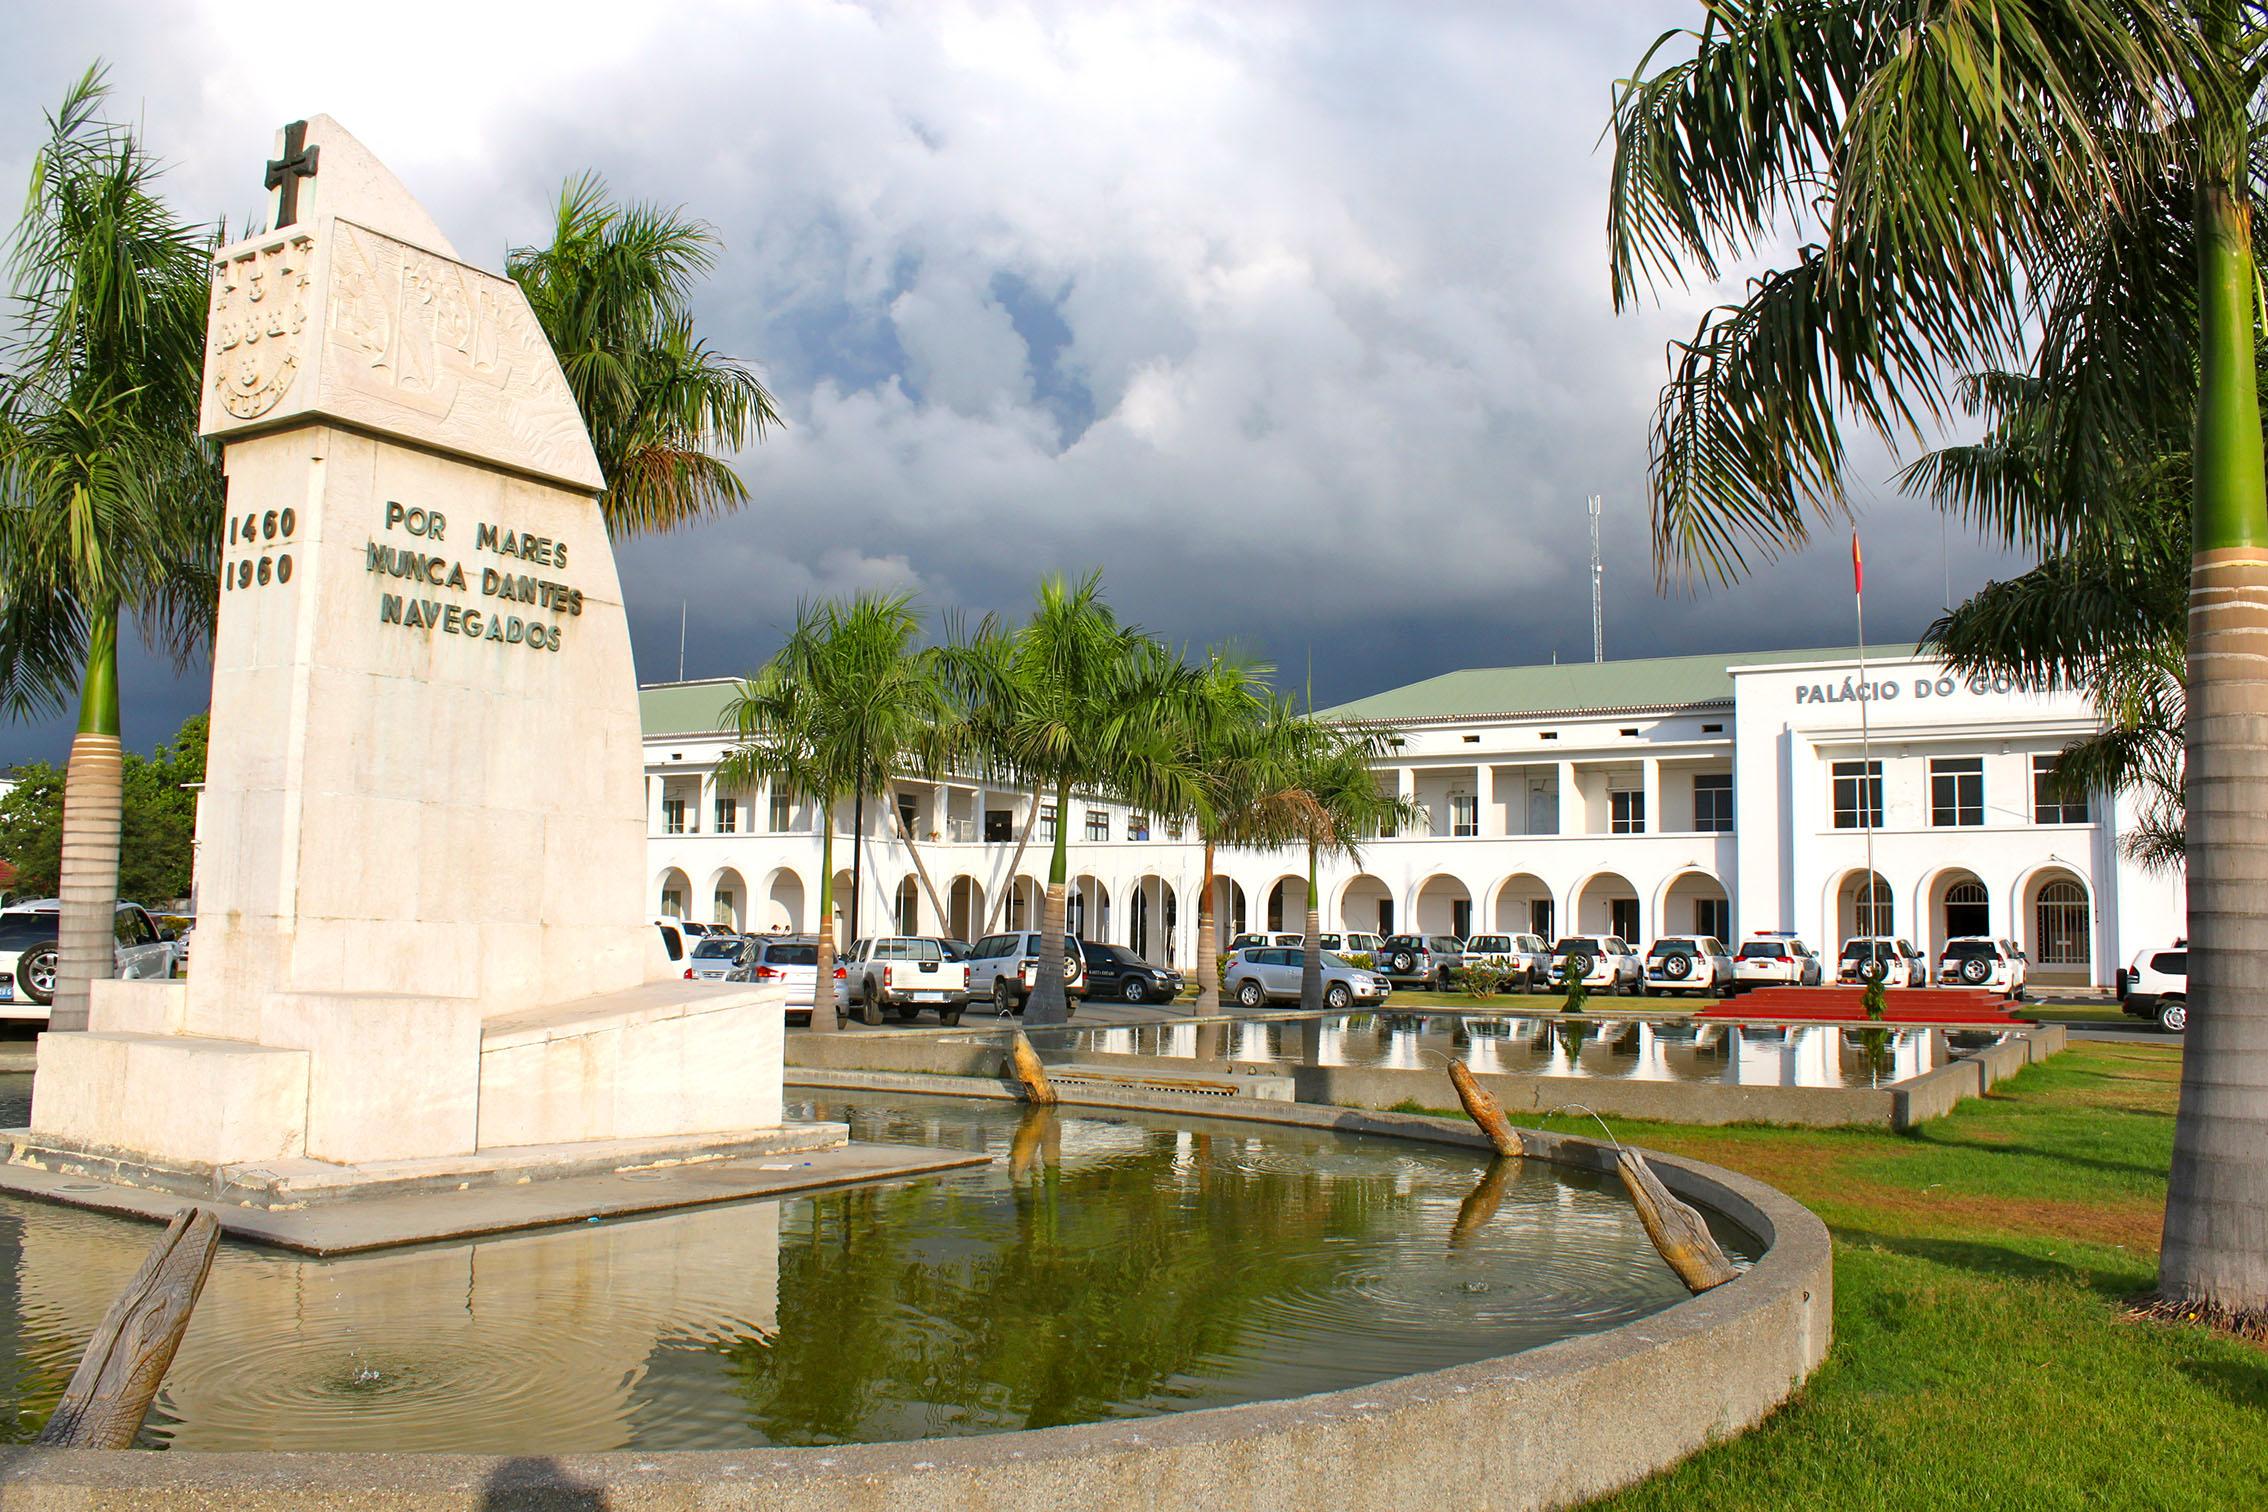 Aeroporto Dili : Dili timor leste thursday 21 july angusmccoll